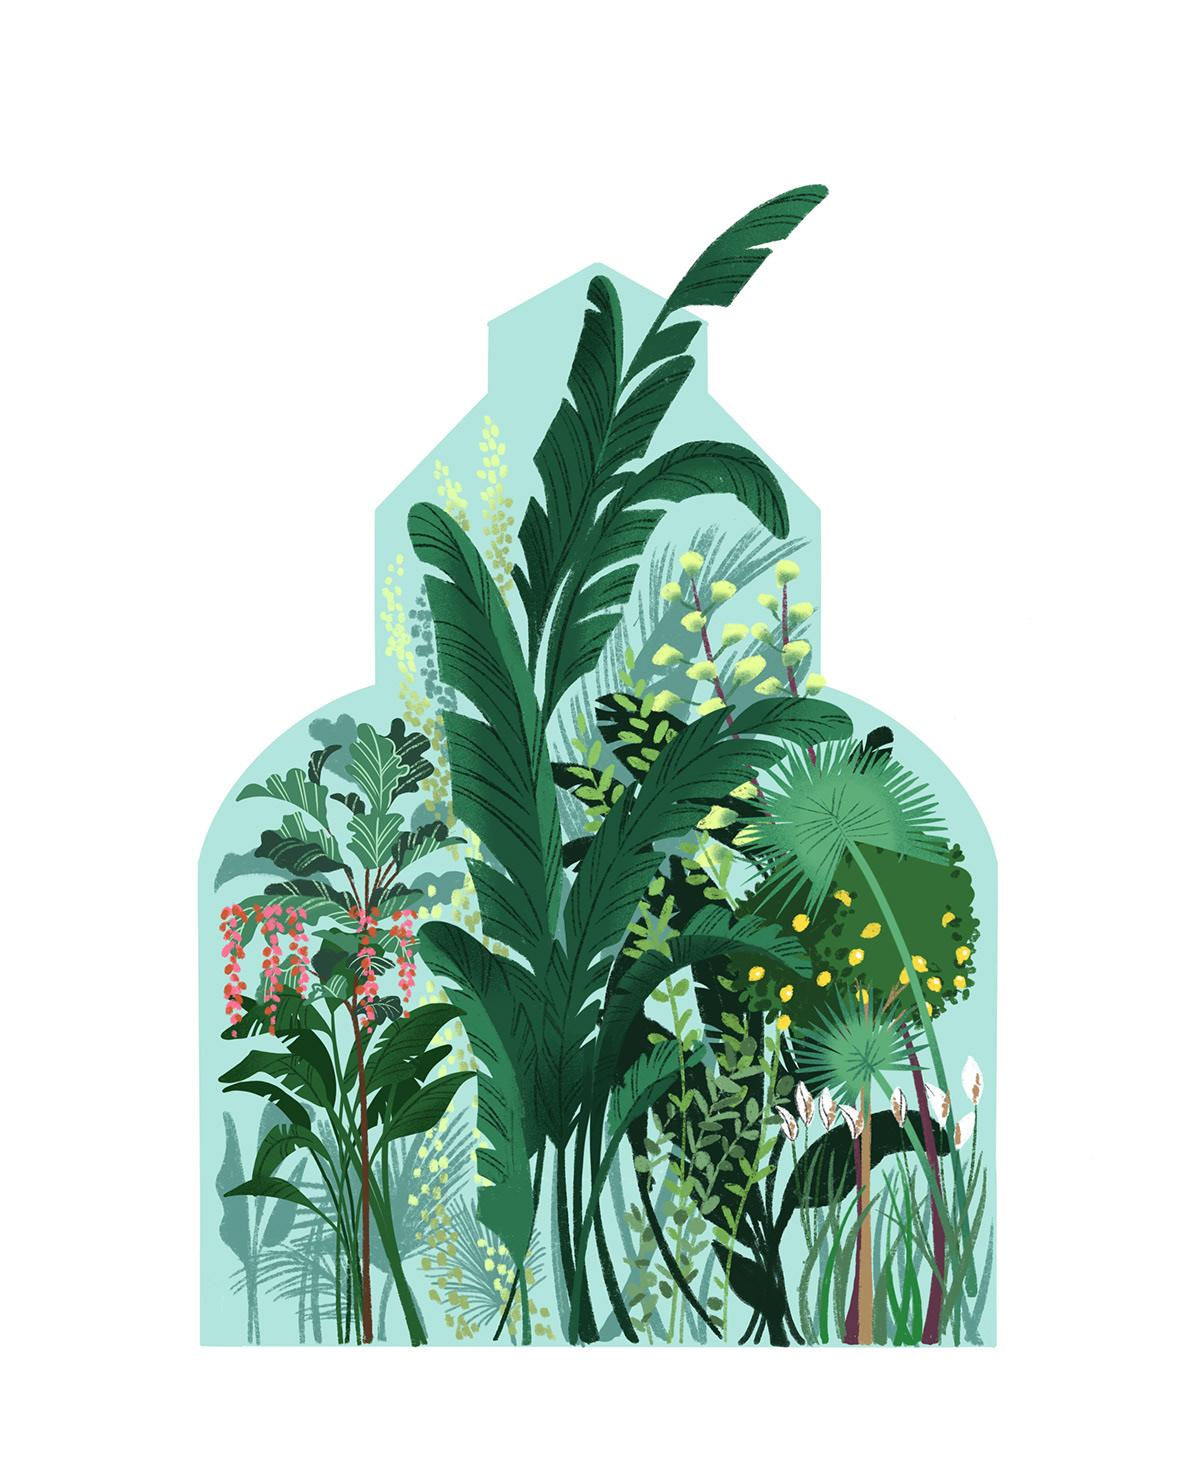 glasshouse greenhouse plants foliage greenery ILLUSTRATION  Digital Art  architecture Palm Tree Tropical